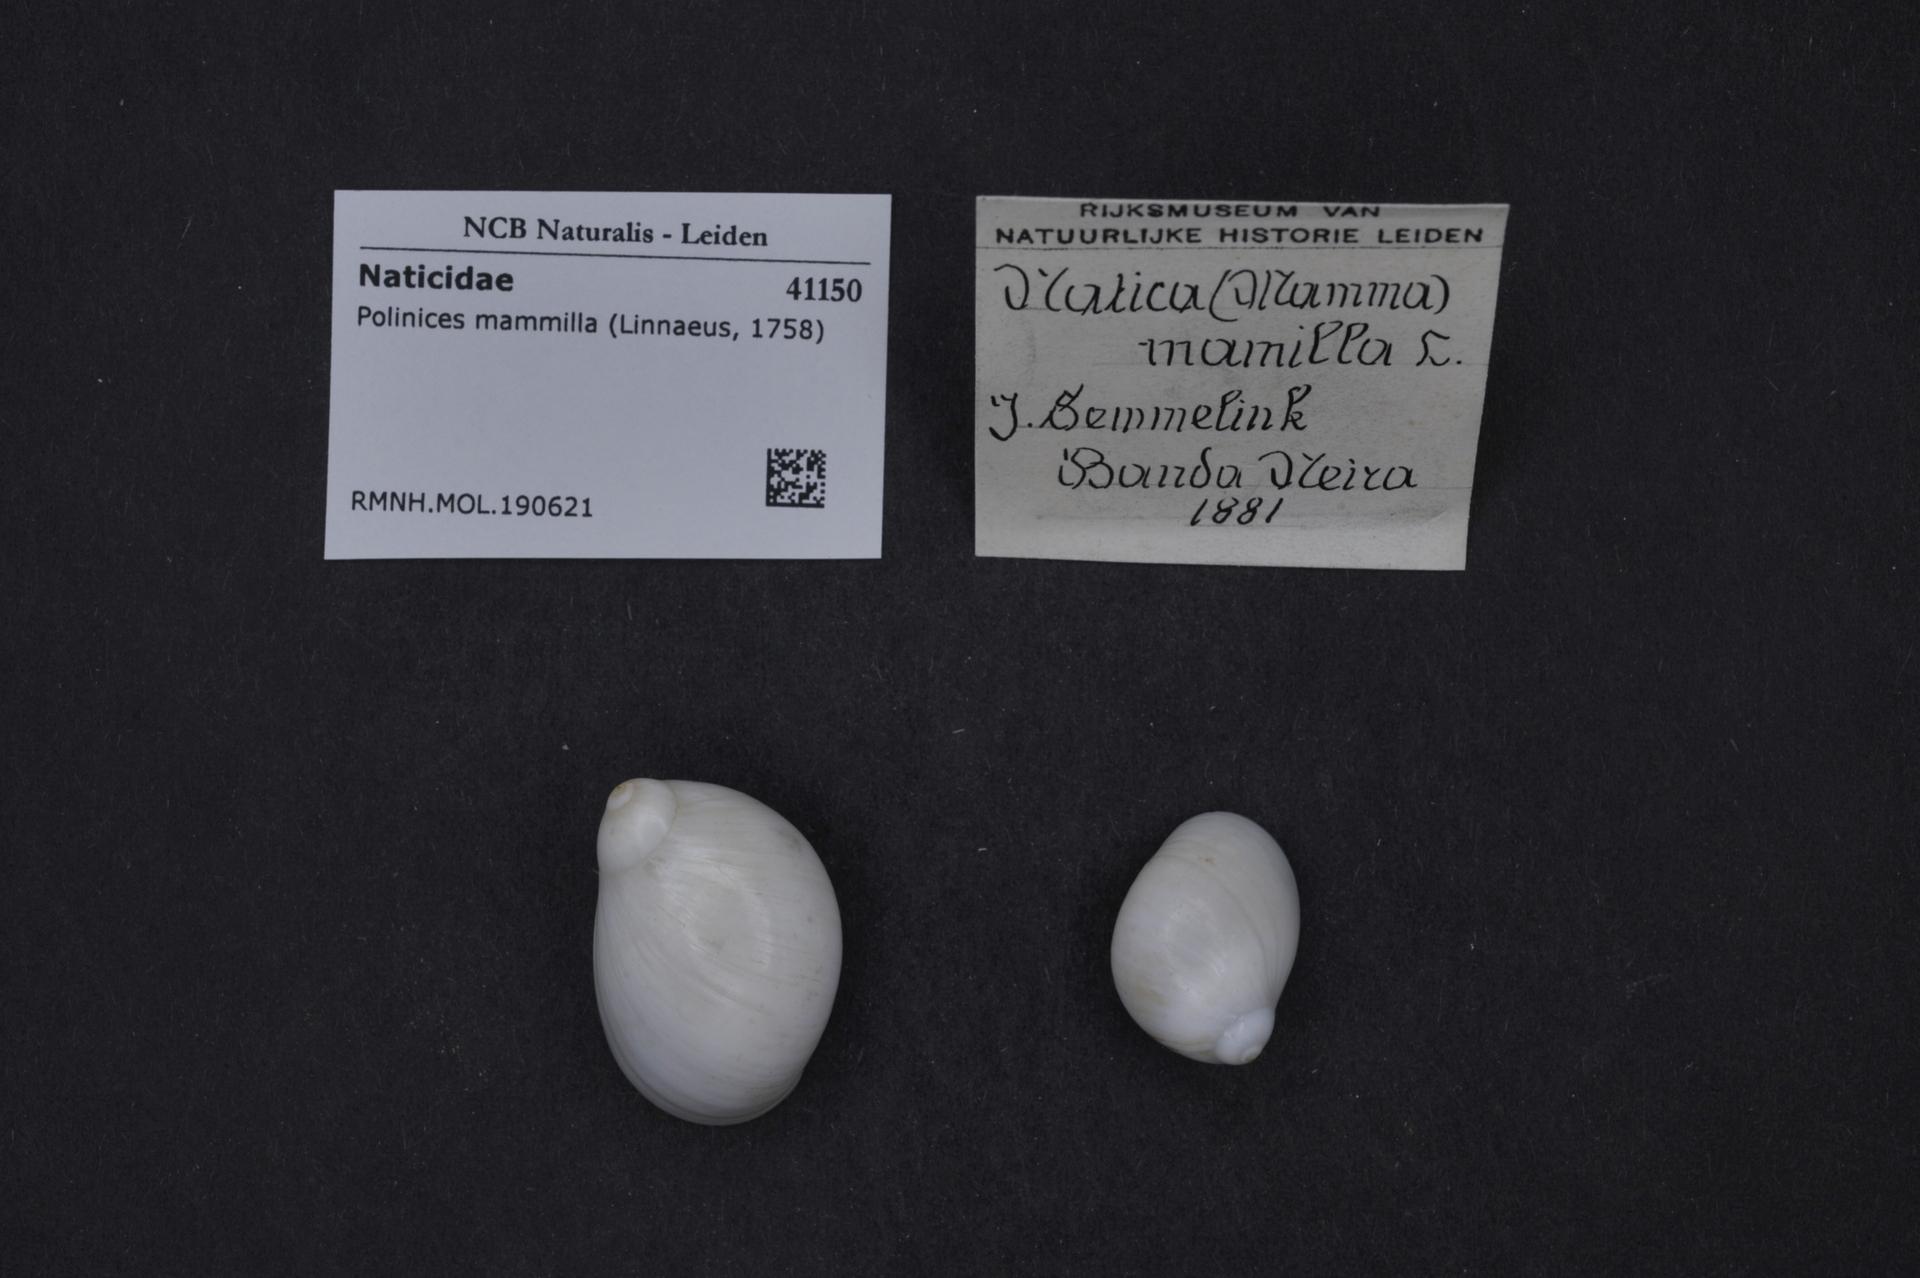 RMNH.MOL.190621 | Polinices mammilla (Linnaeus, 1758)